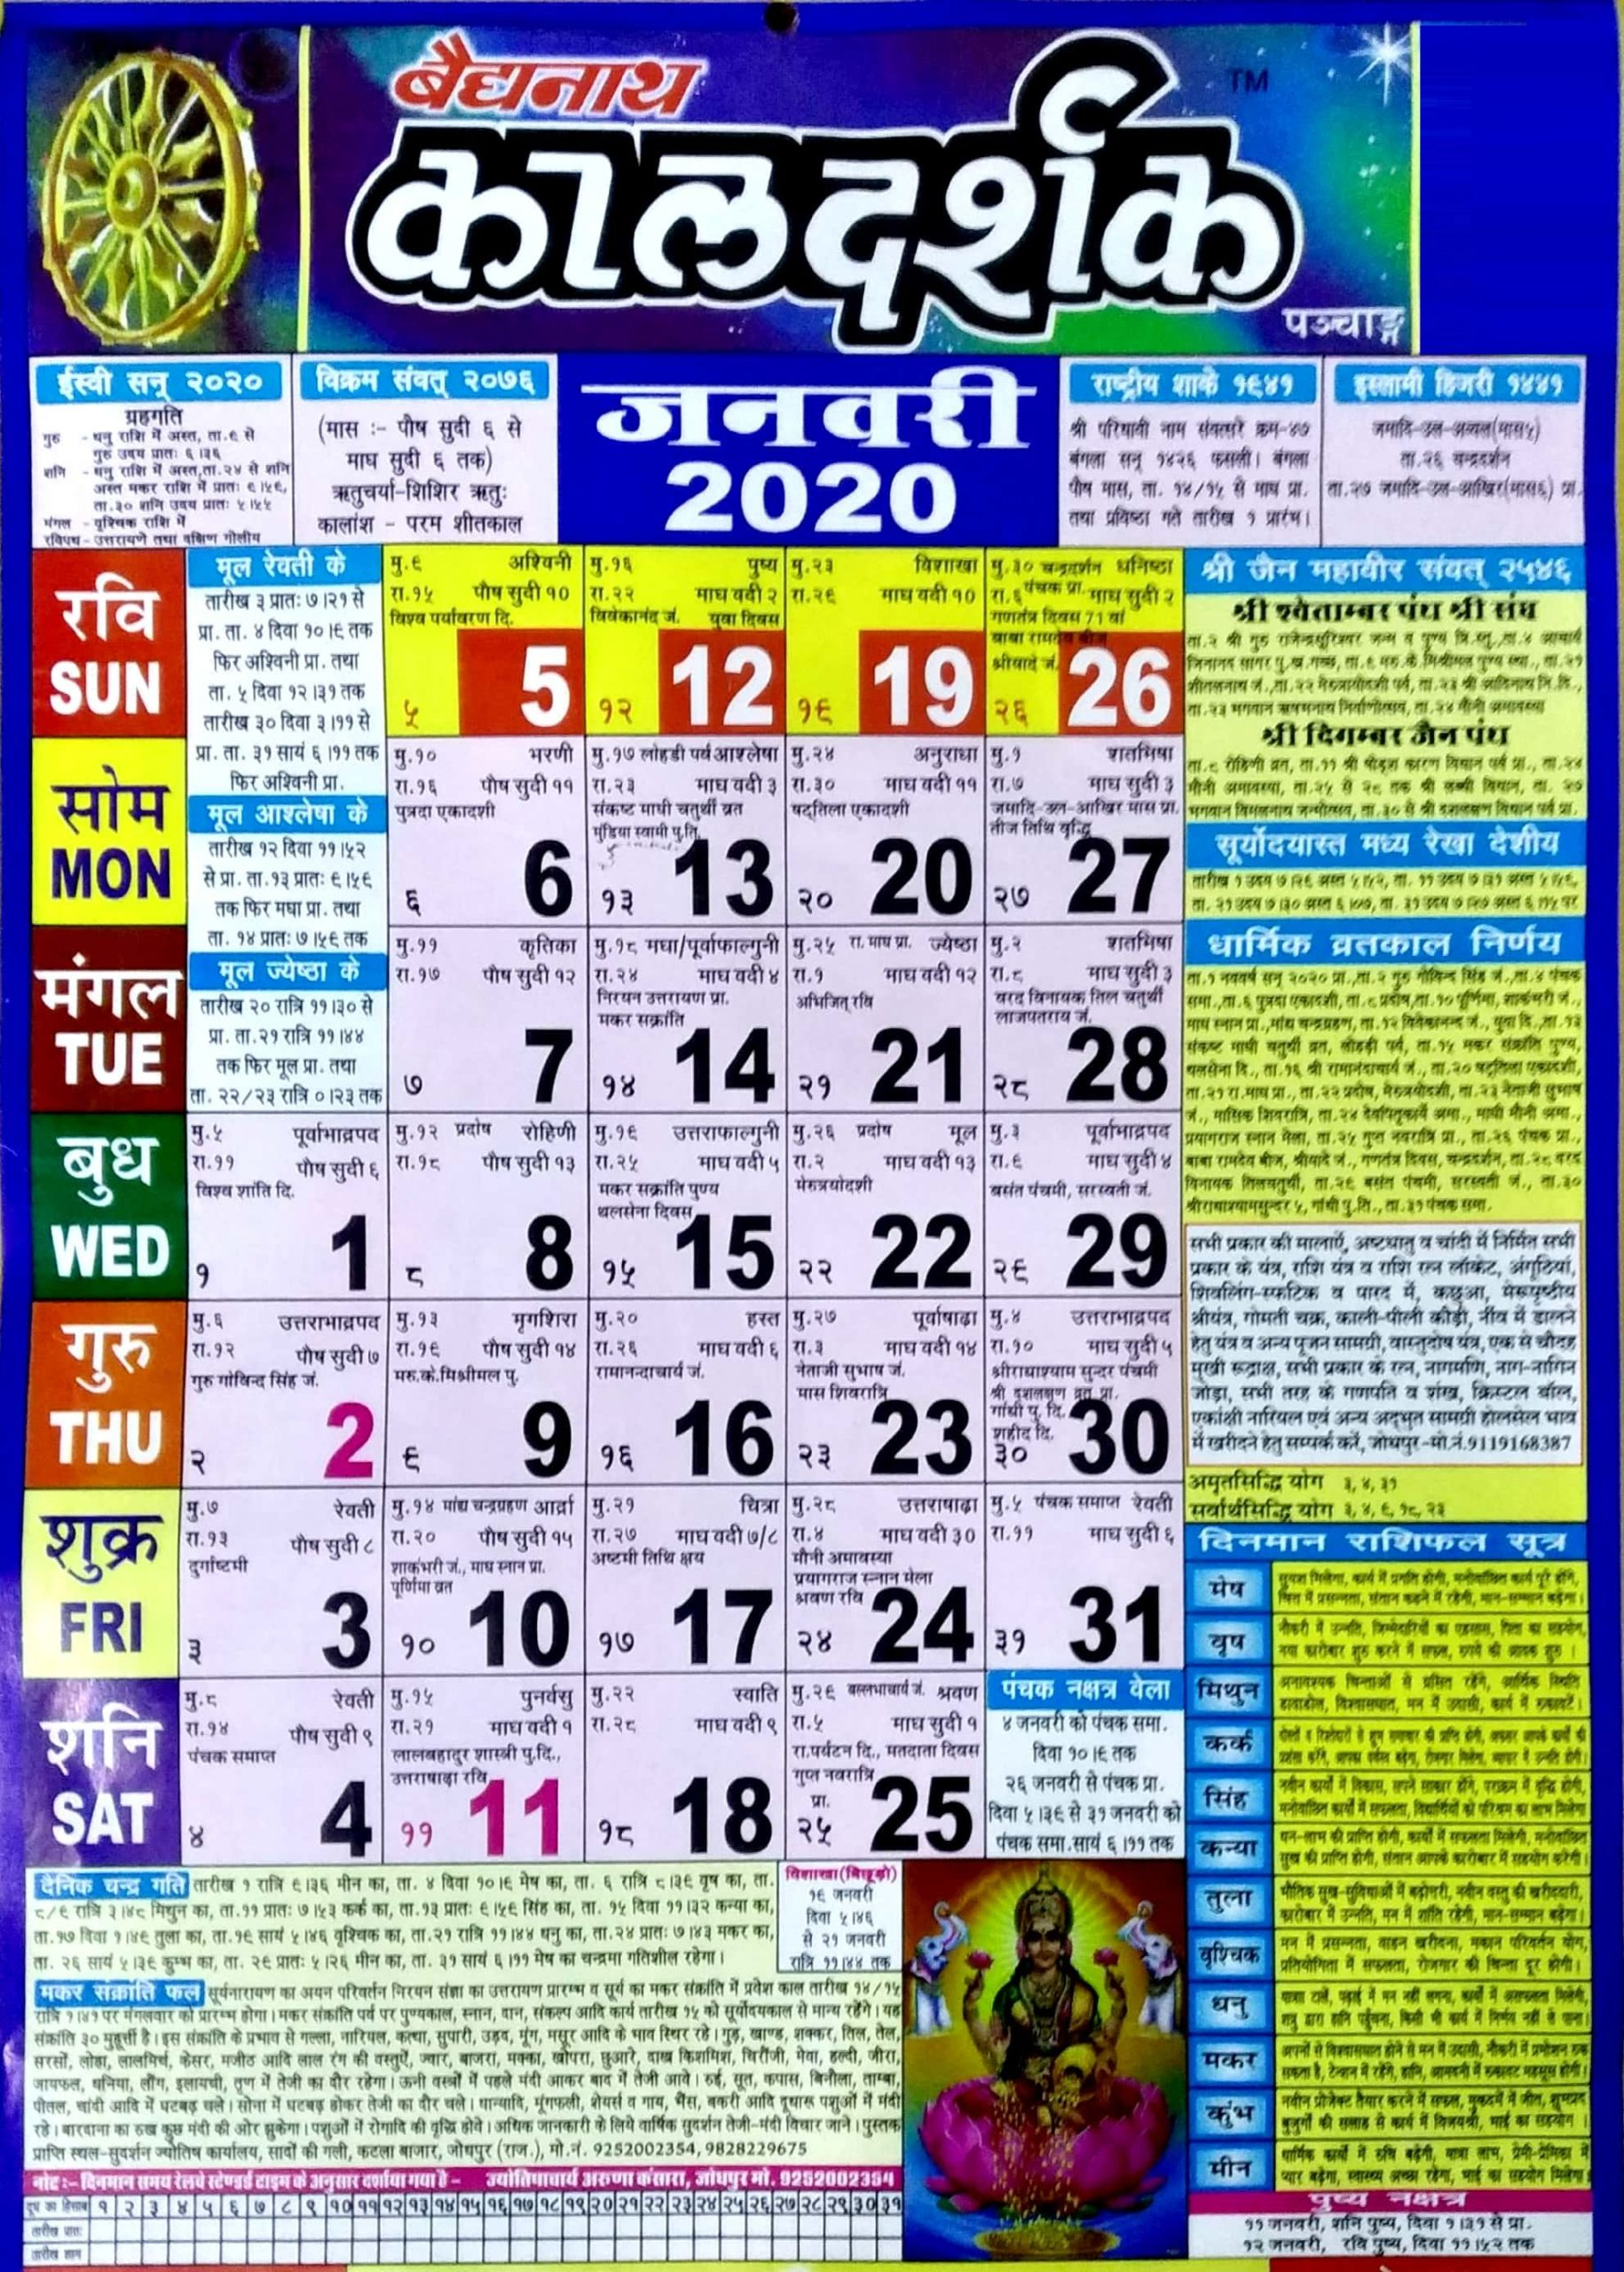 श्रीधरी पंचांग 2020  Shridhari Panchang within 1998 Calendar With Festivals